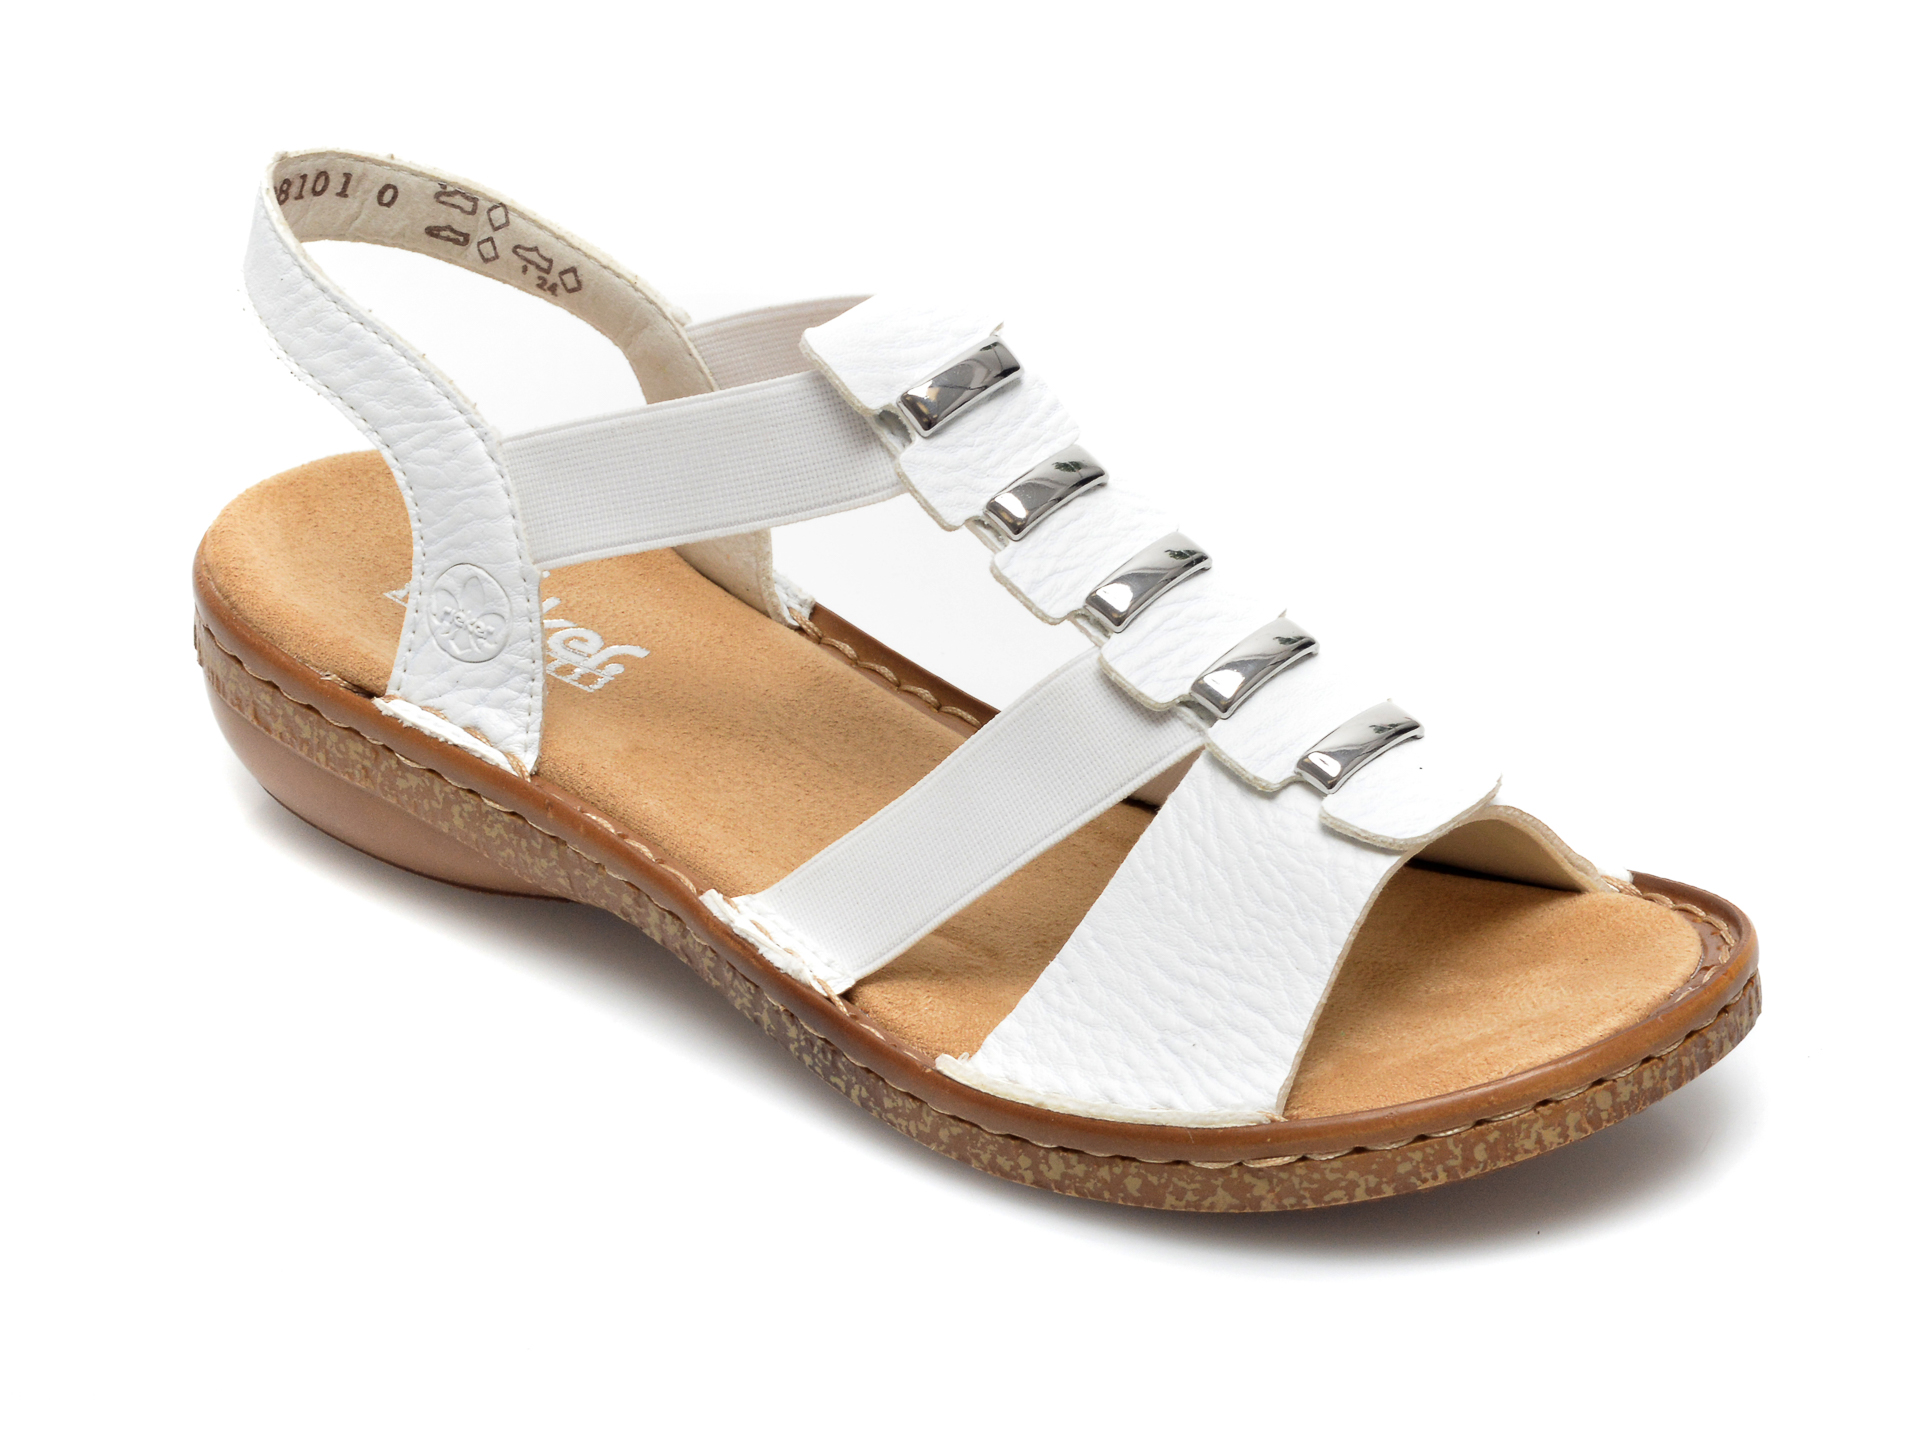 Sandale RIEKER albe, 62850, din piele ecologica imagine otter.ro 2021